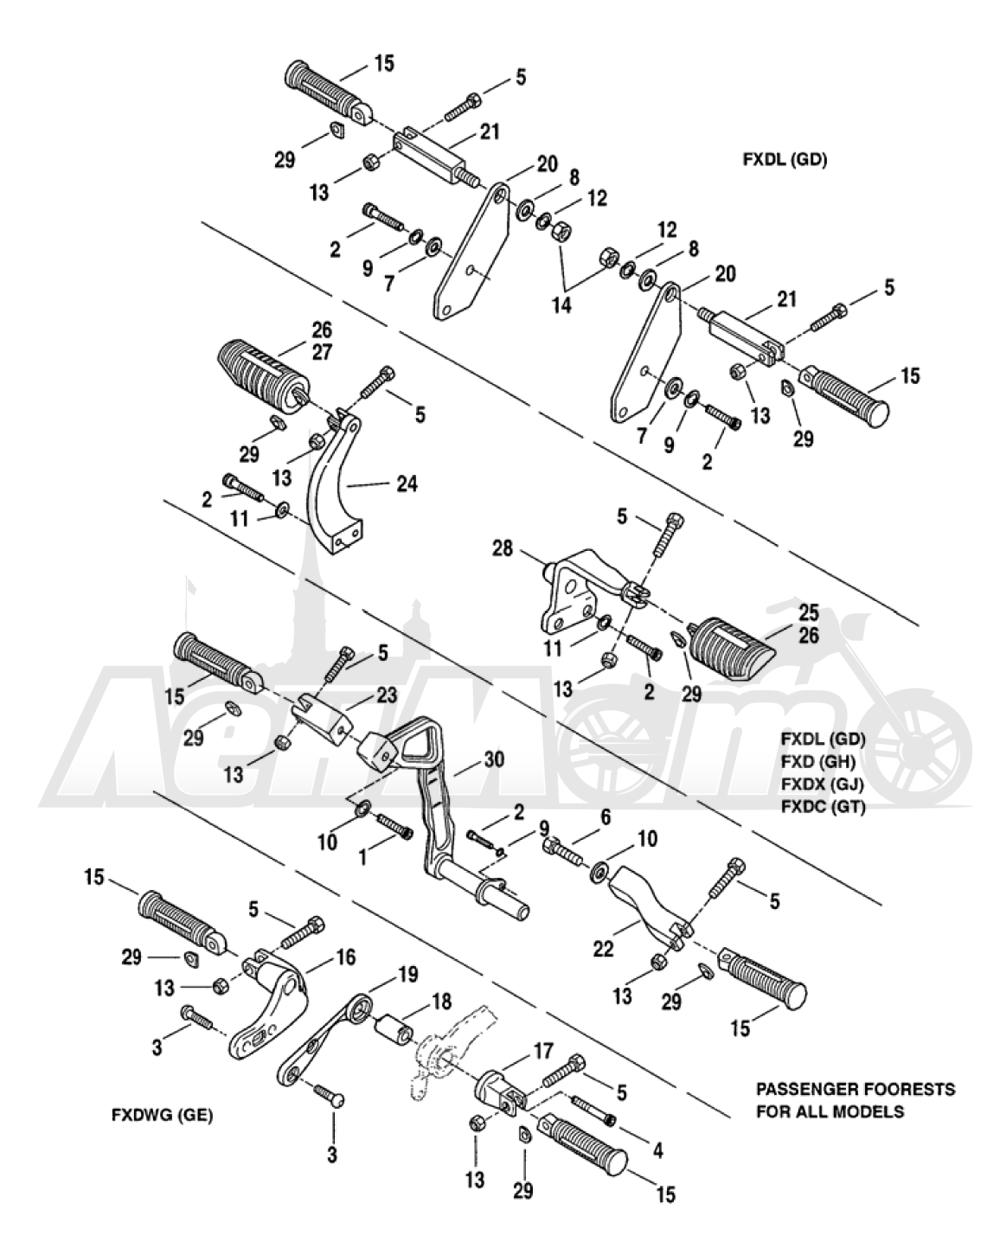 Запчасти для Мотоцикла Harley-Davidson 2005 FXDL DYNA® LOW RIDER (GD) Раздел: FOOTRESTS ASSEMBLY | подножки в сборе